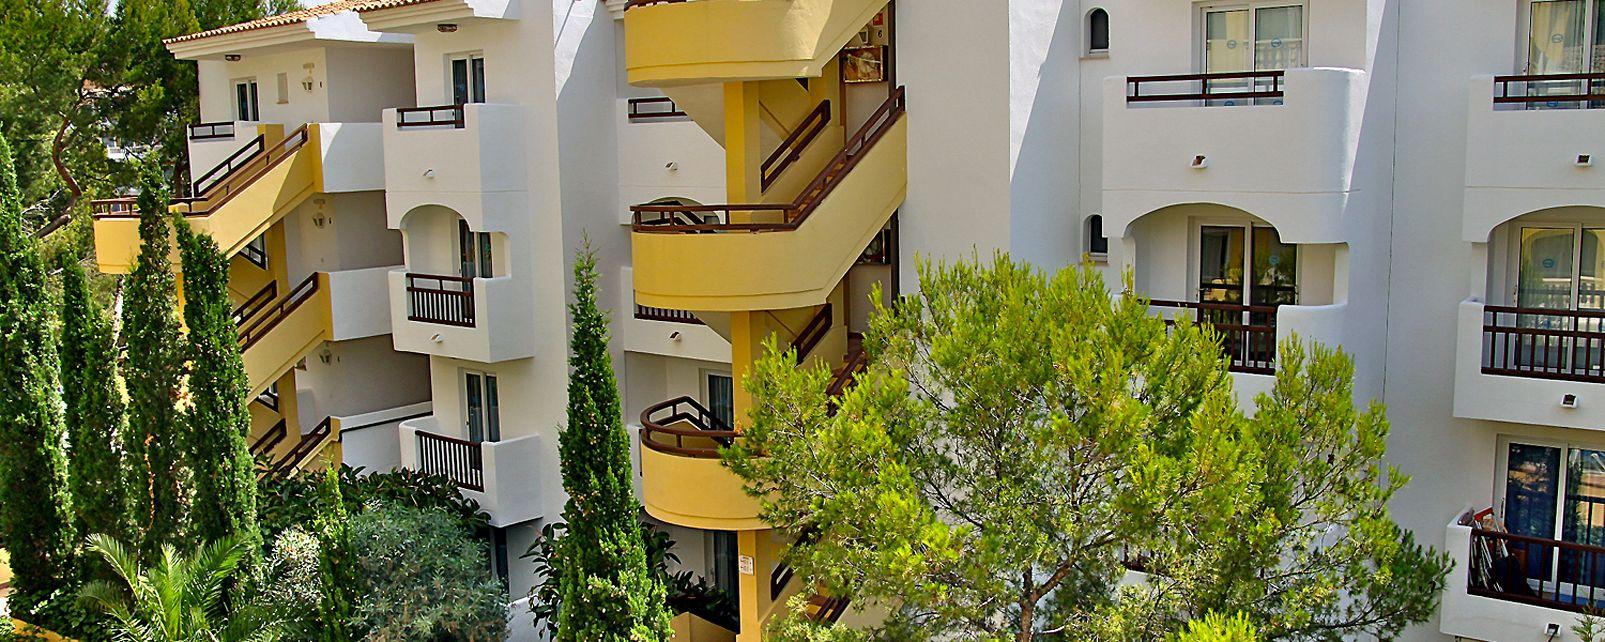 Hôtel Roc Illetas